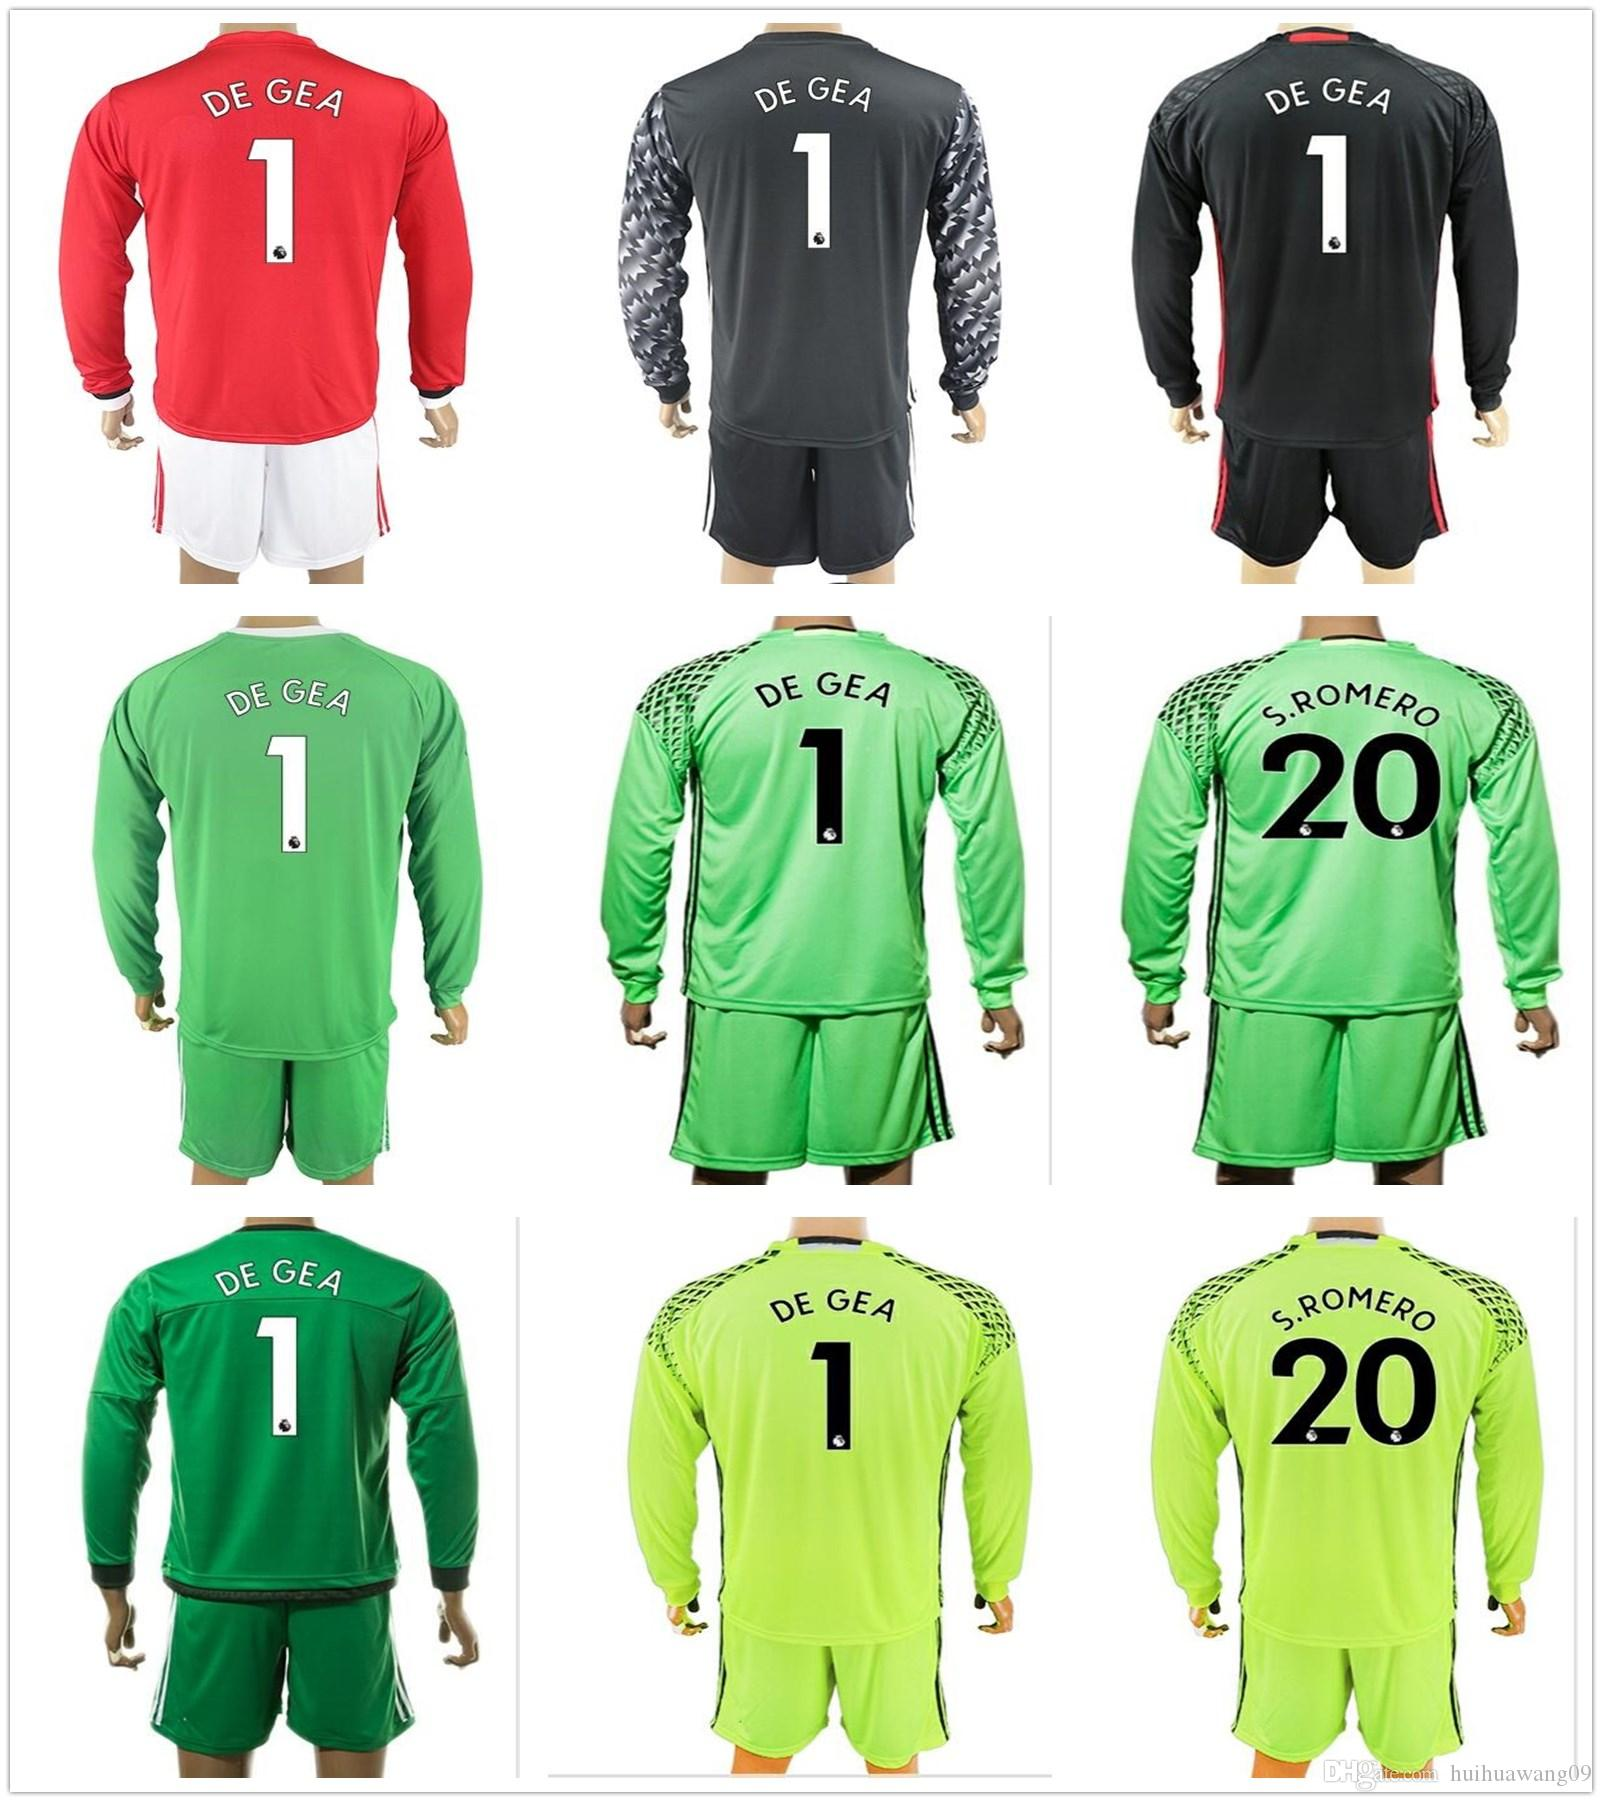 6531c3964 argentina 1 romero red goalkeeper 2018 fifa world cup soccer jersey  2017 2018  long goalkeeper united kit goalkeeper soccer sets 1 david de gea 20 s.